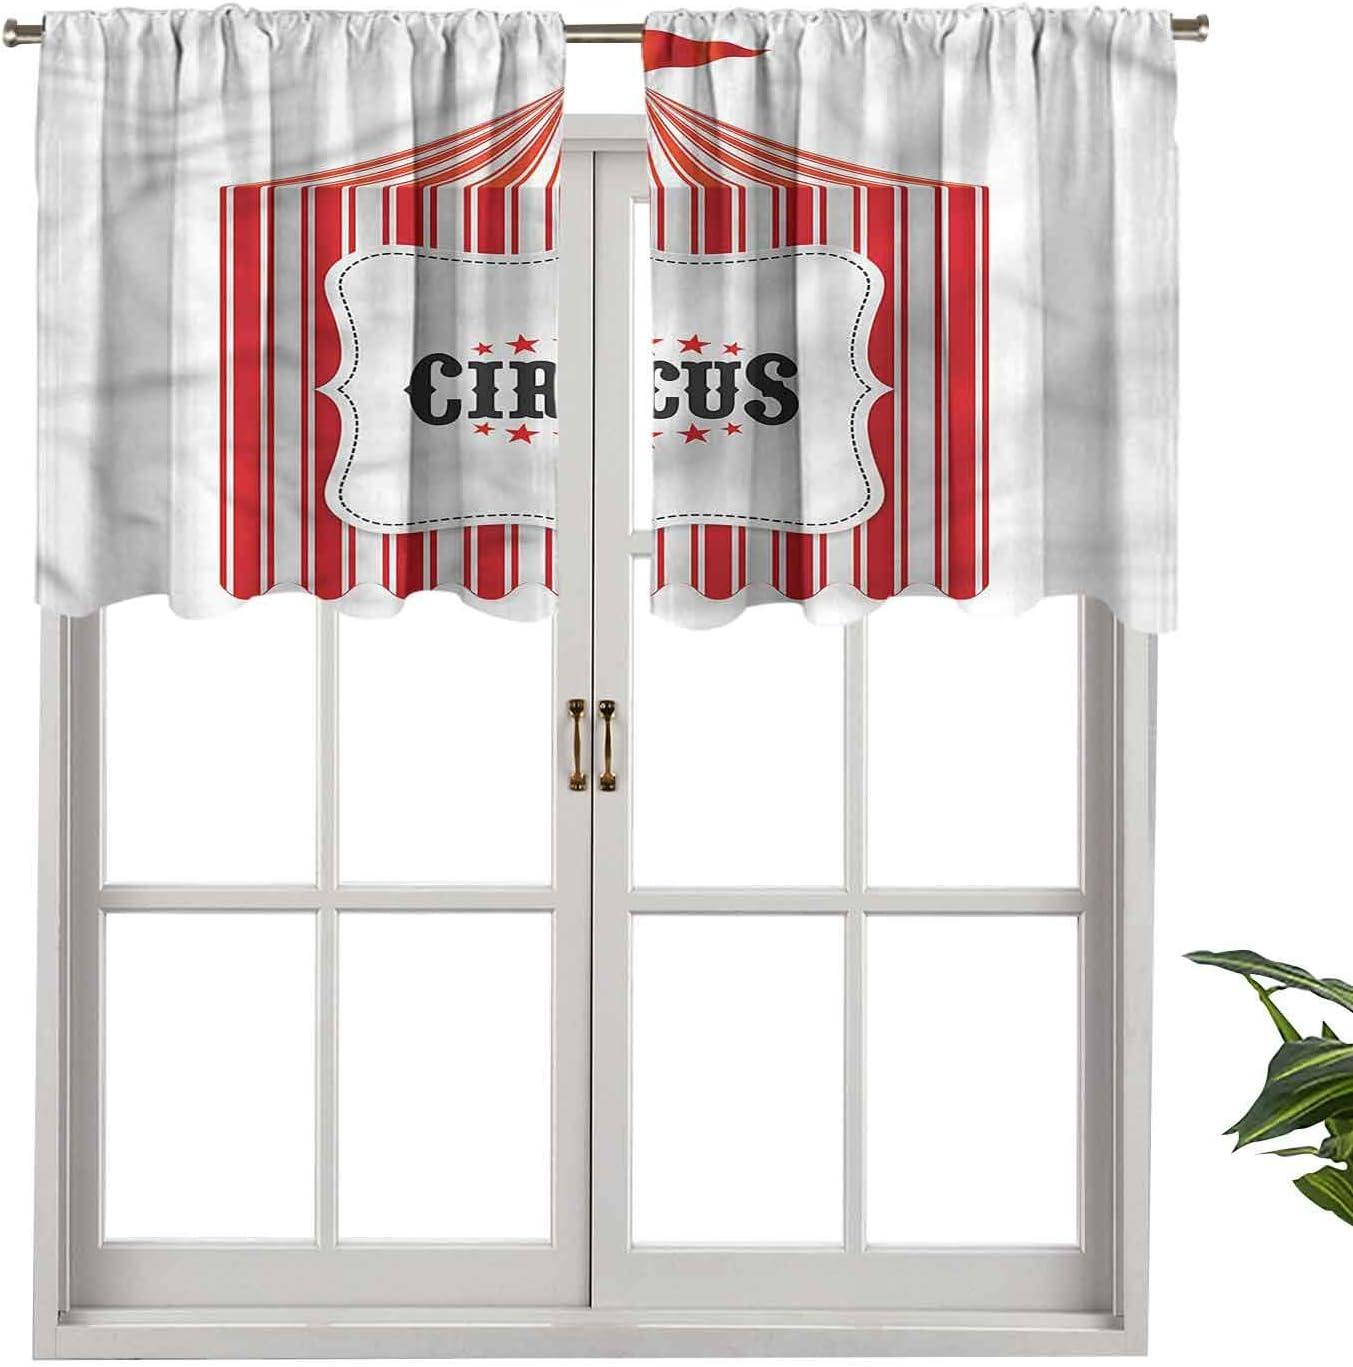 Hiiiman Fashion Design Cenefa térmica aislada ventana paneles circo tienda de campaña, juego de 1, 127 x 45 cm para habitación de niños